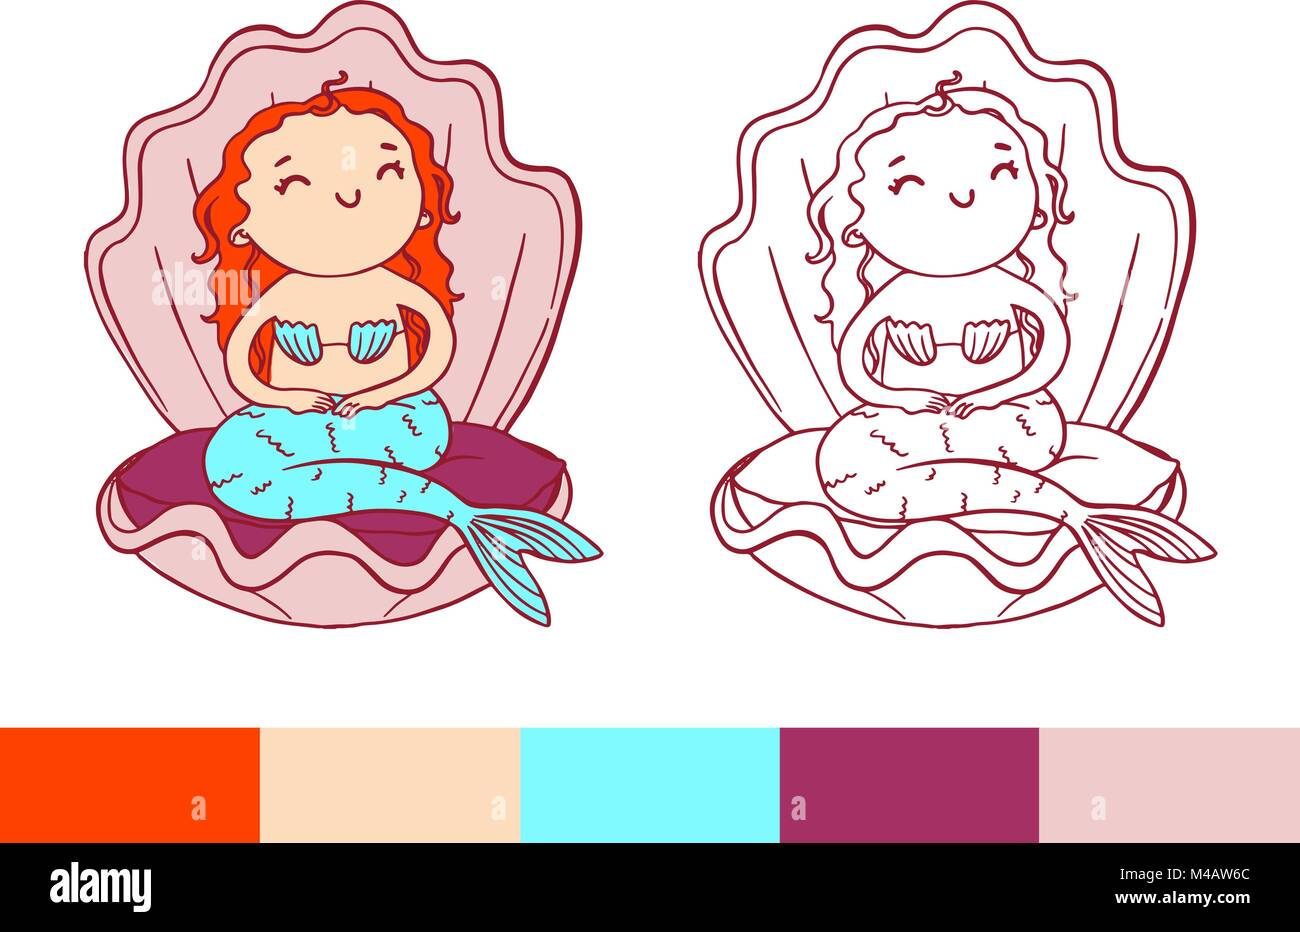 Wunderbar Kleine Meerjungfrau Färbung Seite Fotos ...